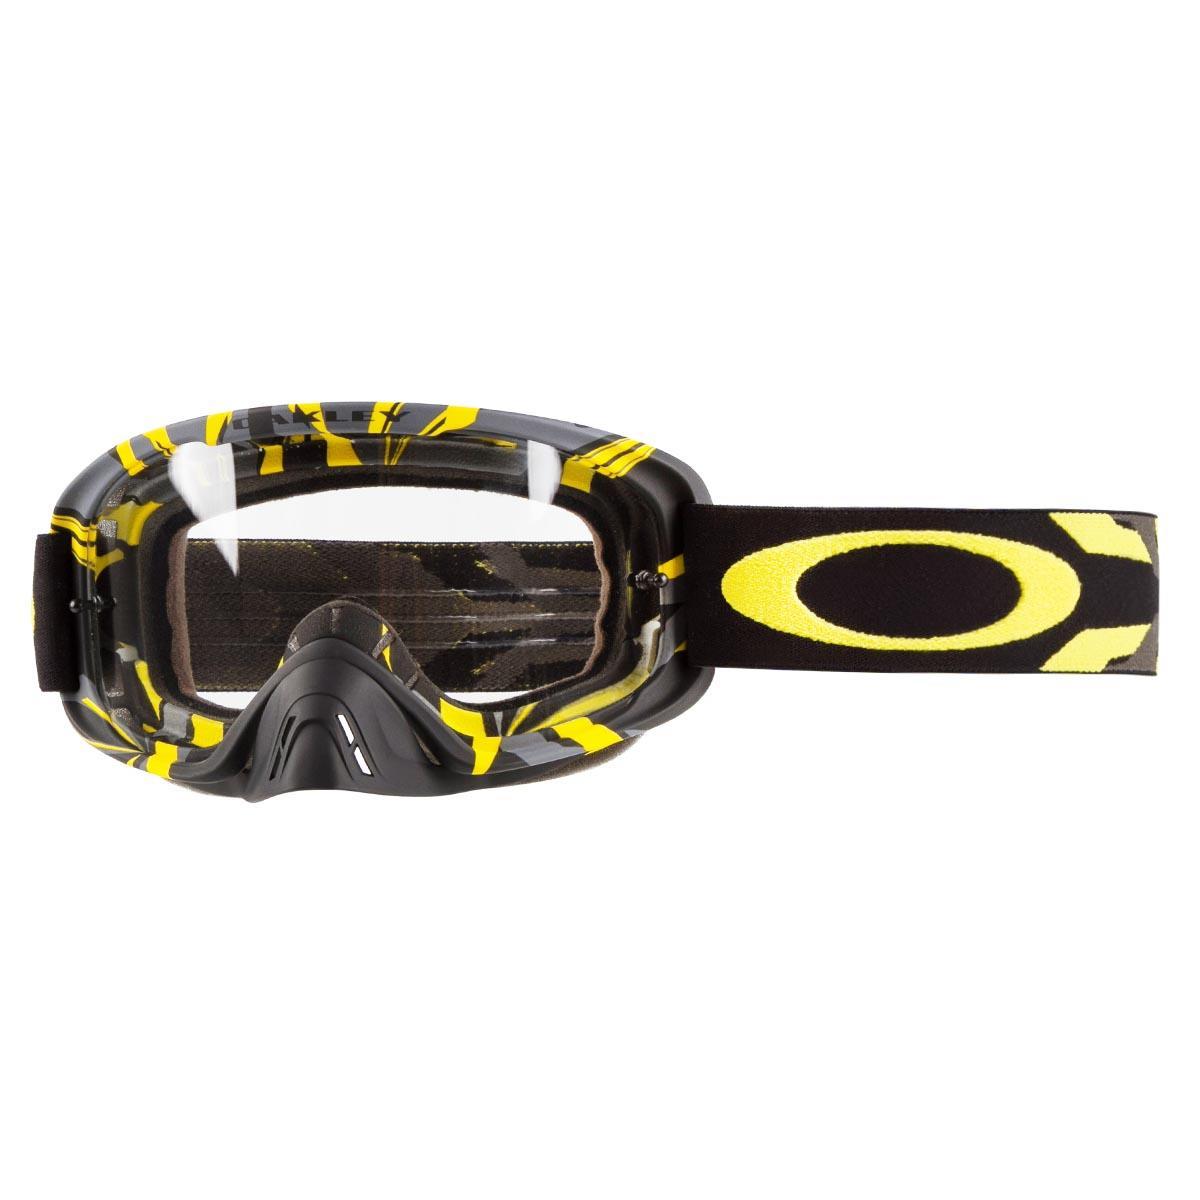 b1b6a66c1 Oakley Goggle O2 MX Intimidator Gun Metal Yellow - Clear Spring 2018 ...